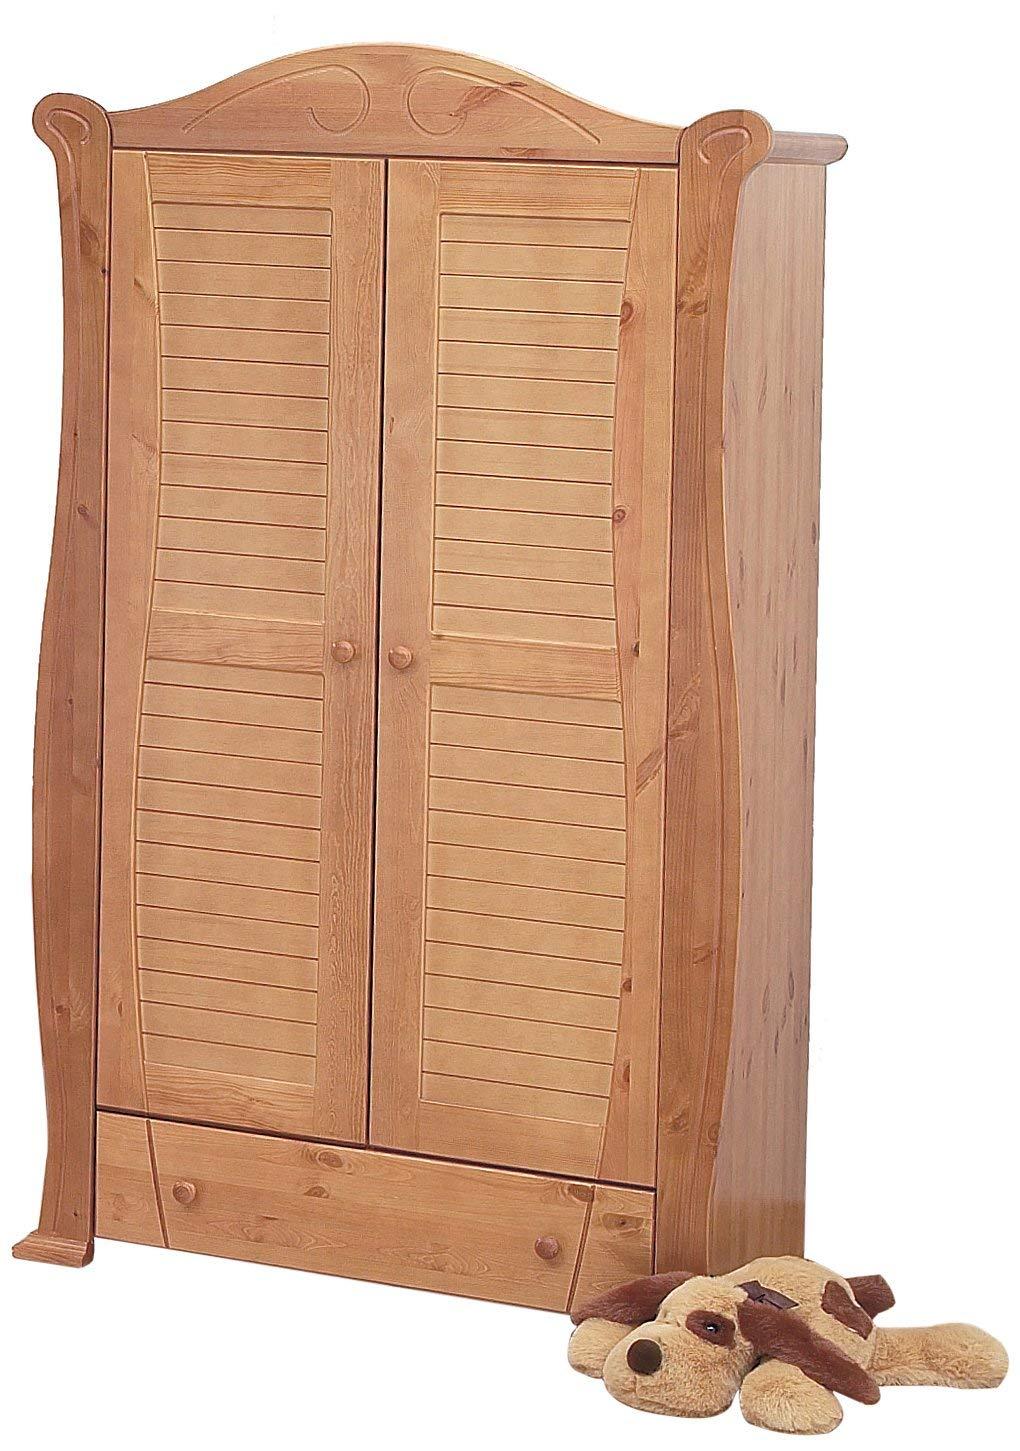 Solid Chinese Oak Wardrobe £109 at Amazon reduced from £639 @ Tutti Bambini UK